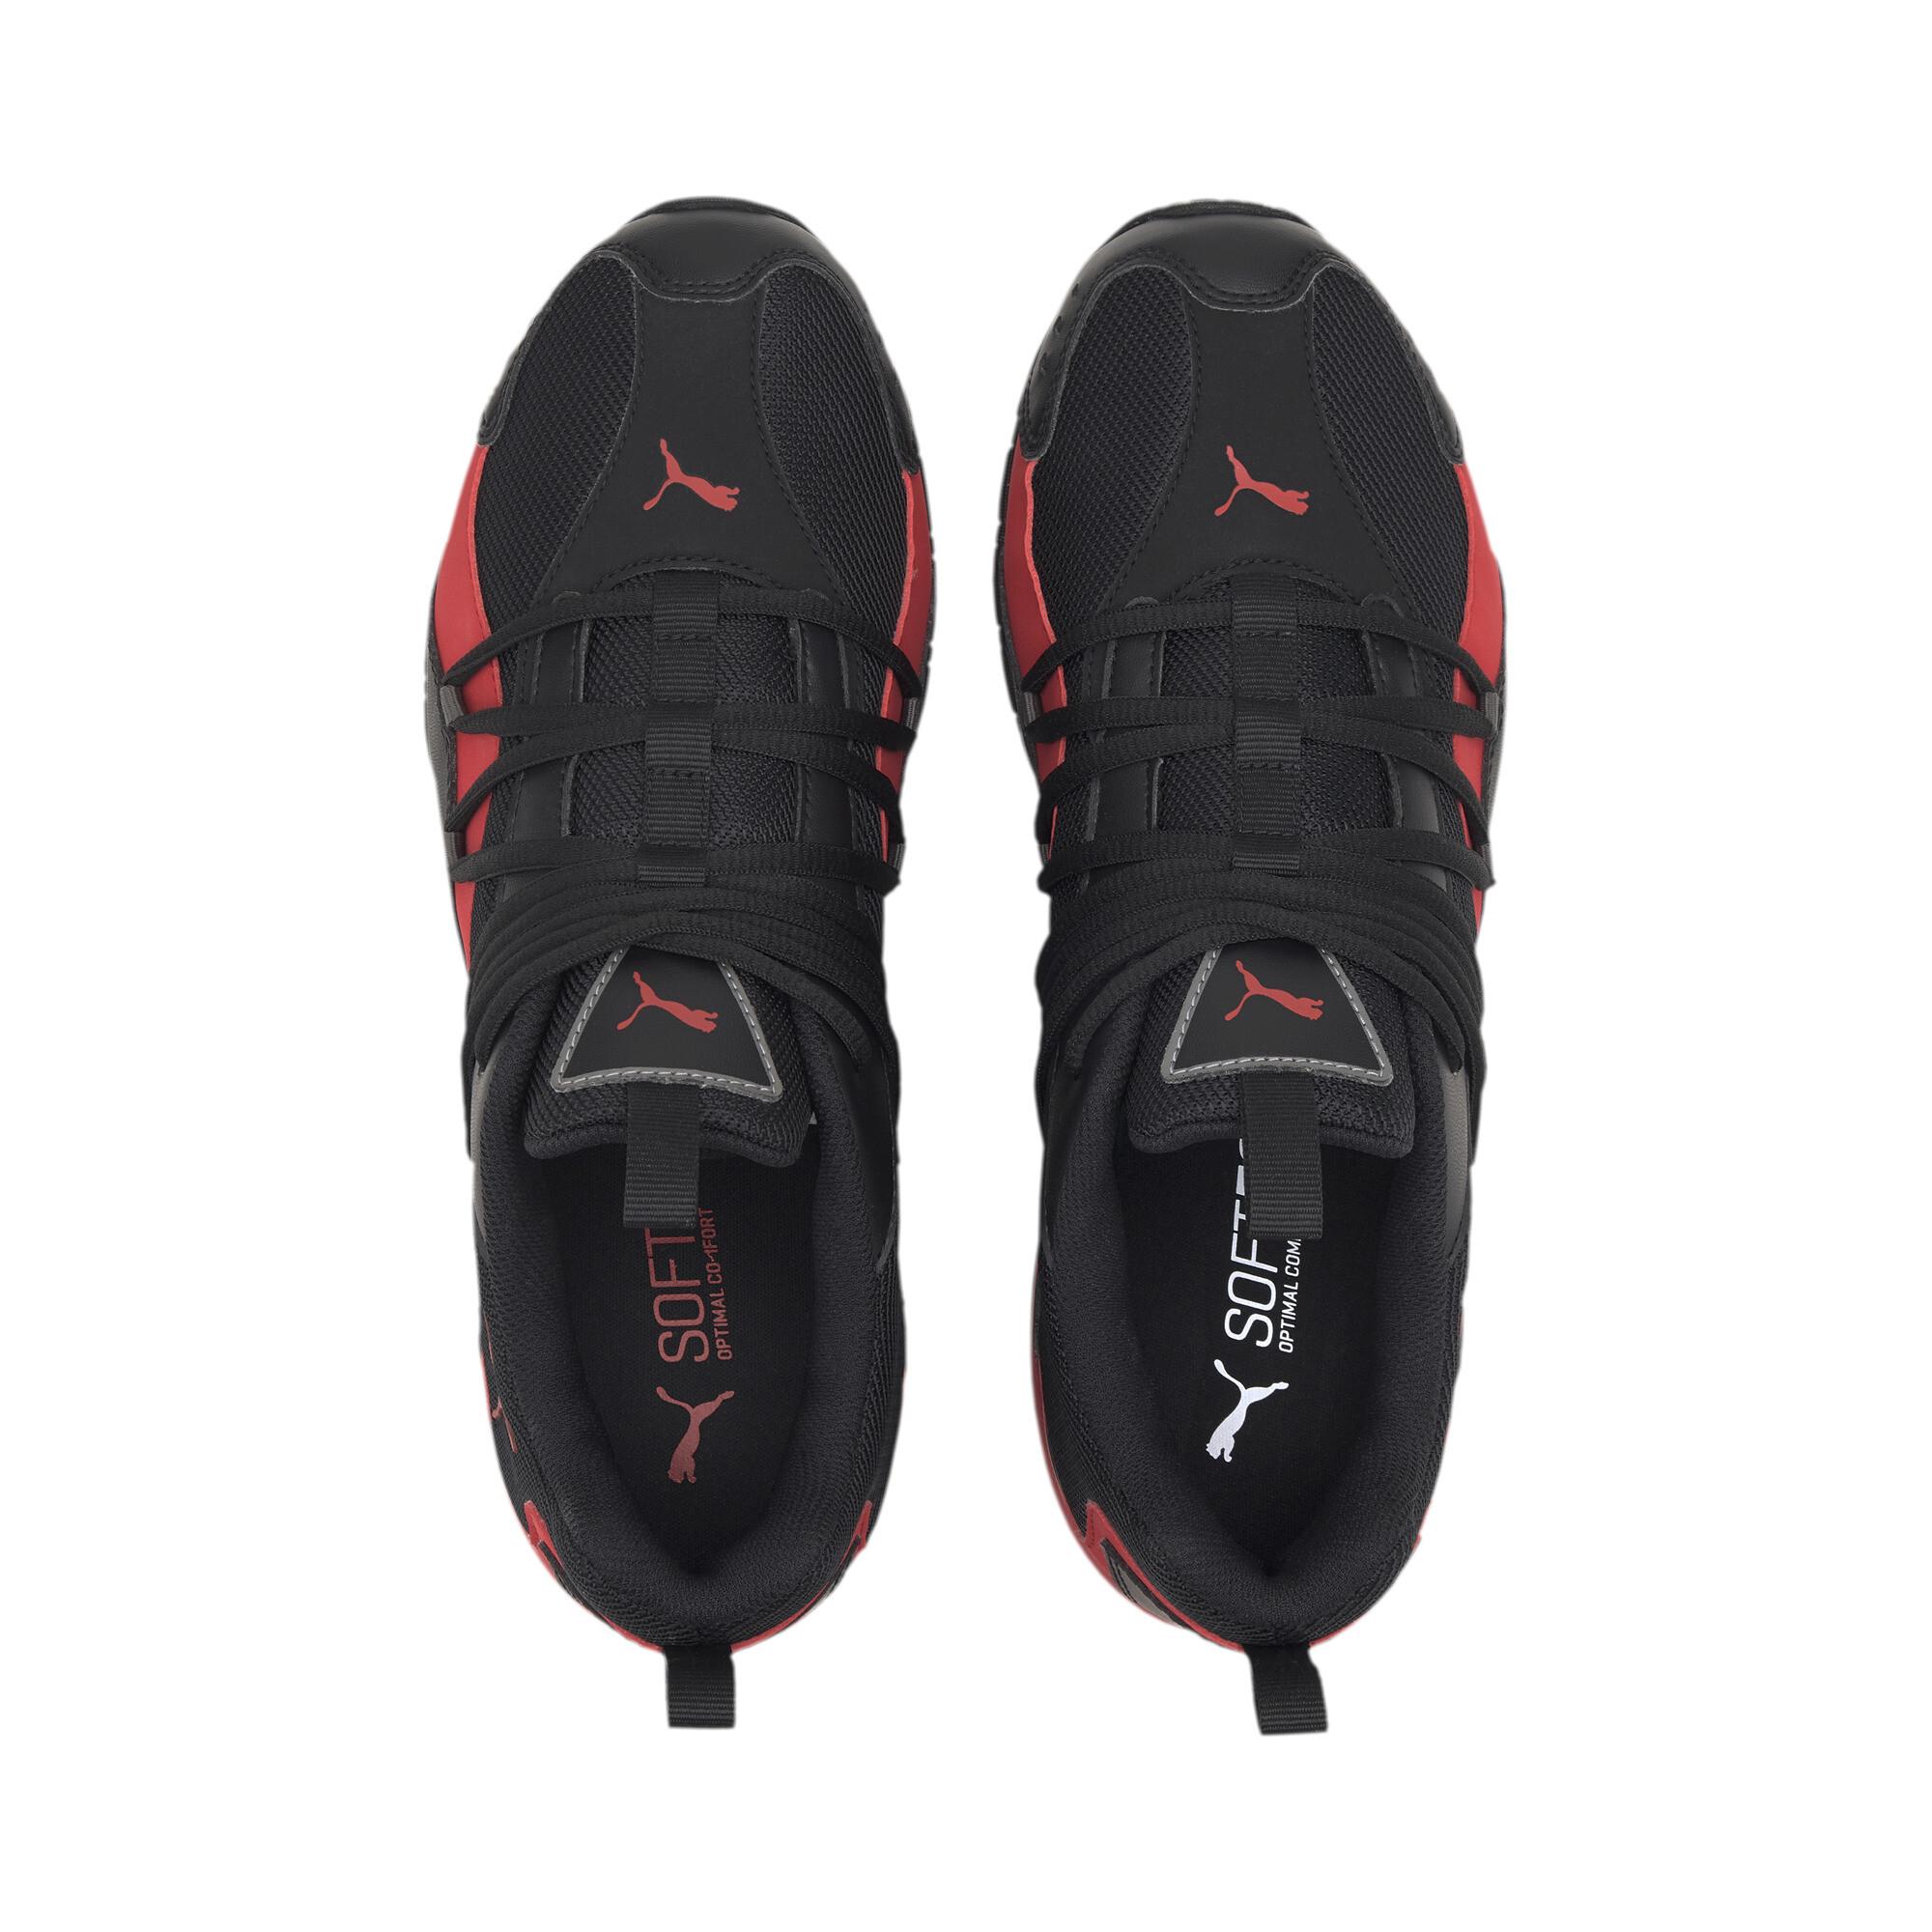 PUMA-Men-039-s-Silverion-Running-Shoes thumbnail 19